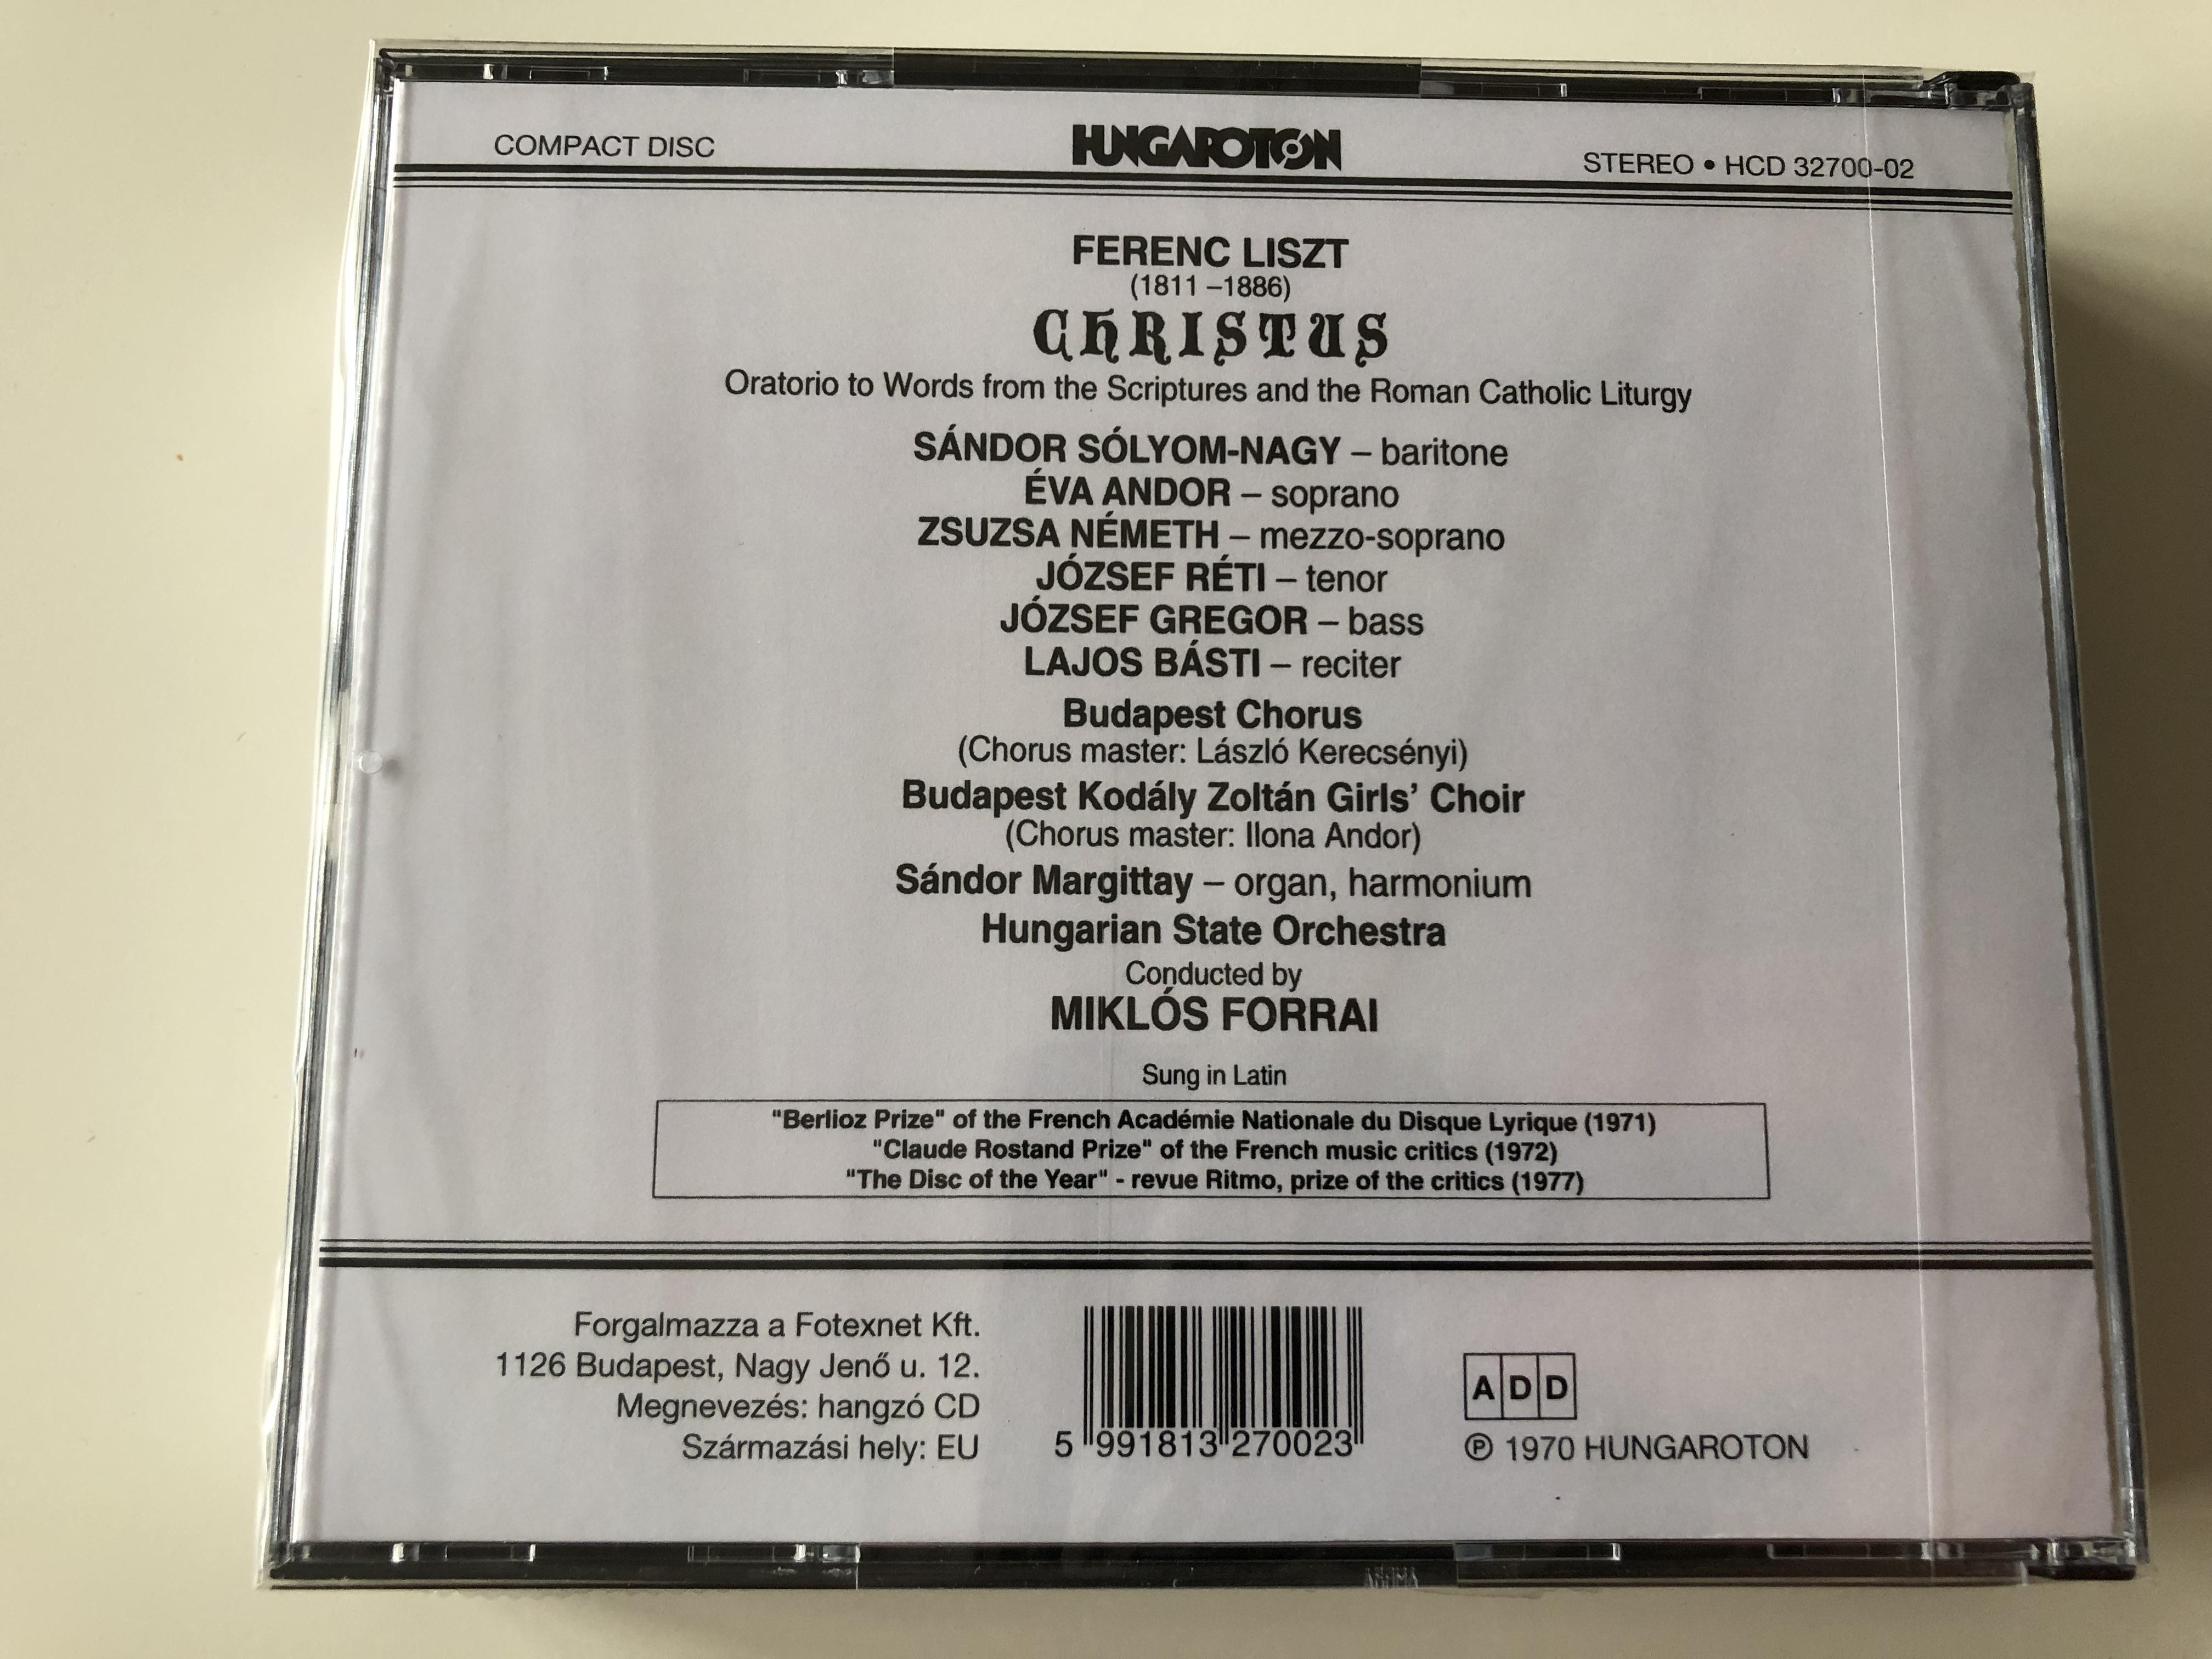 liszt-ferenc-cristus-oratorio-cd-4-.jpg